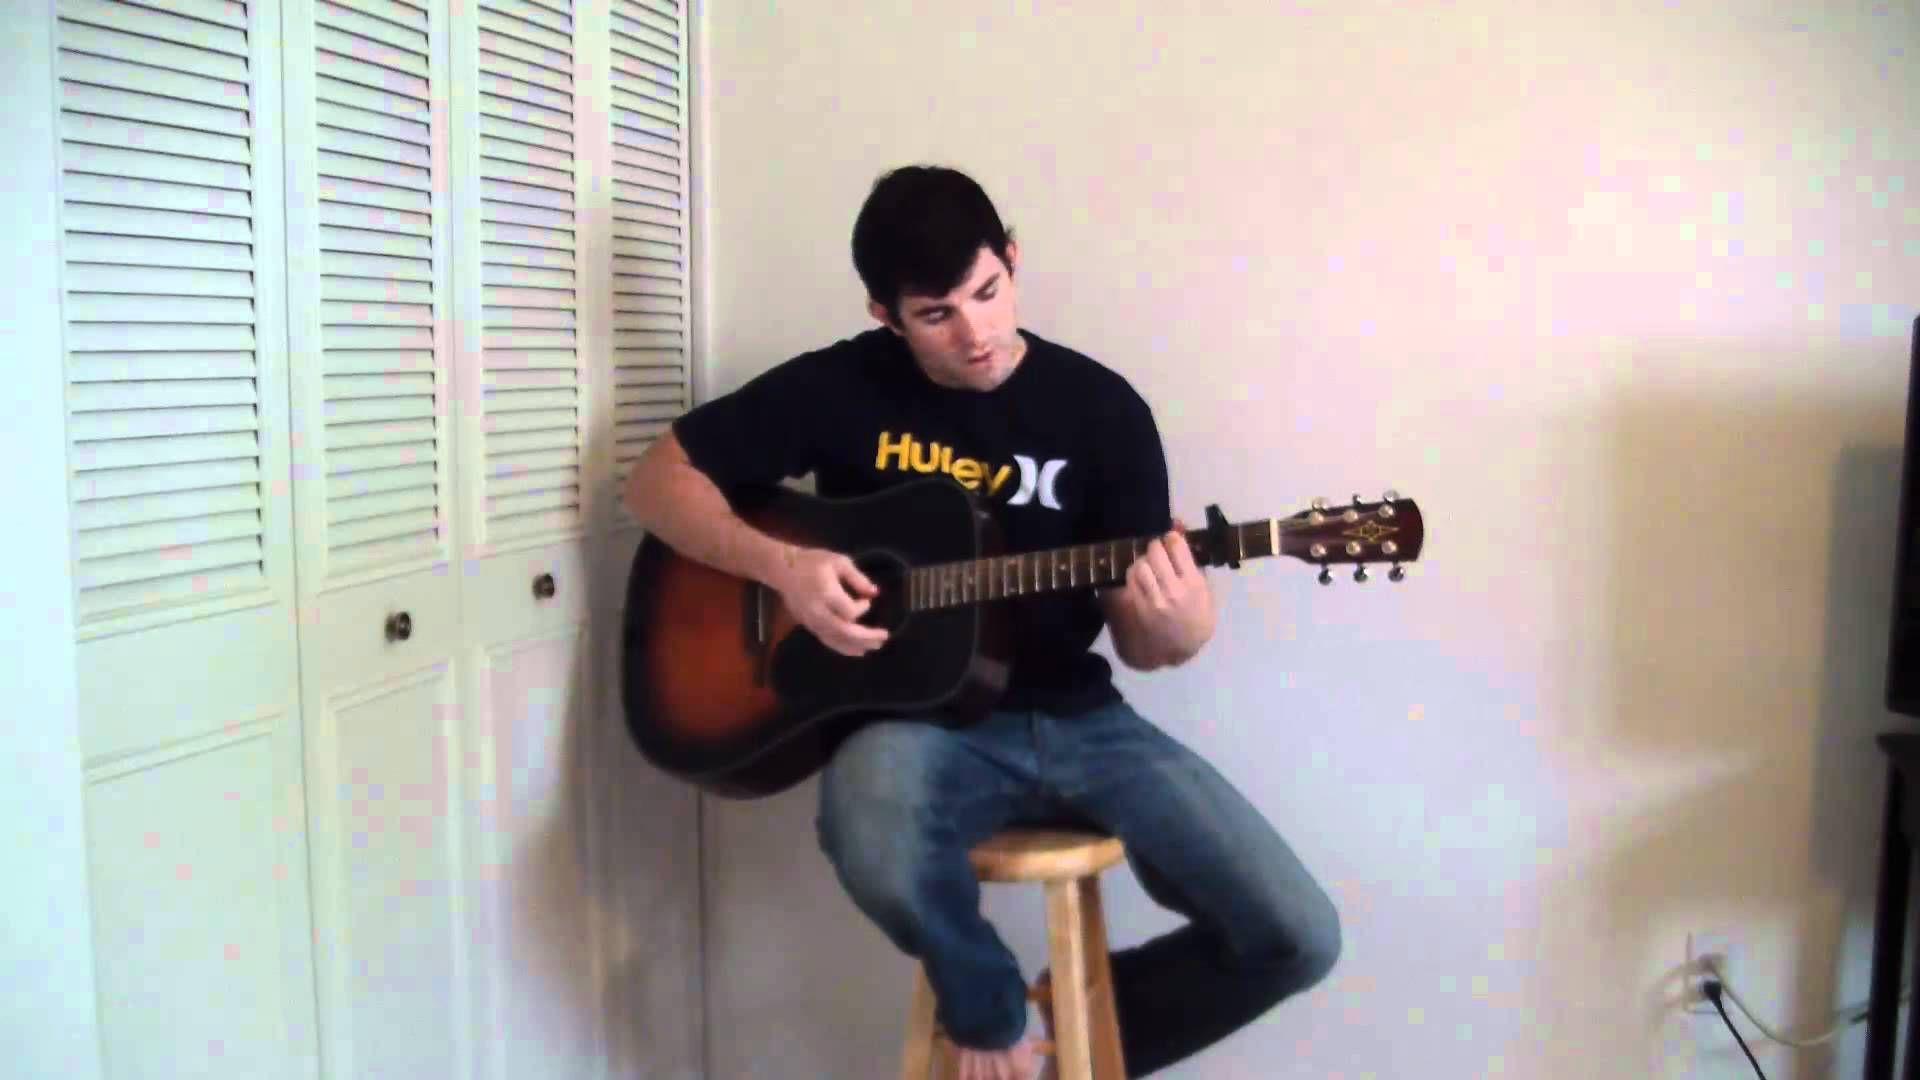 oasis wonderwall guitar lesson guitar chords and guitar tab part 2 guitar things guitar. Black Bedroom Furniture Sets. Home Design Ideas